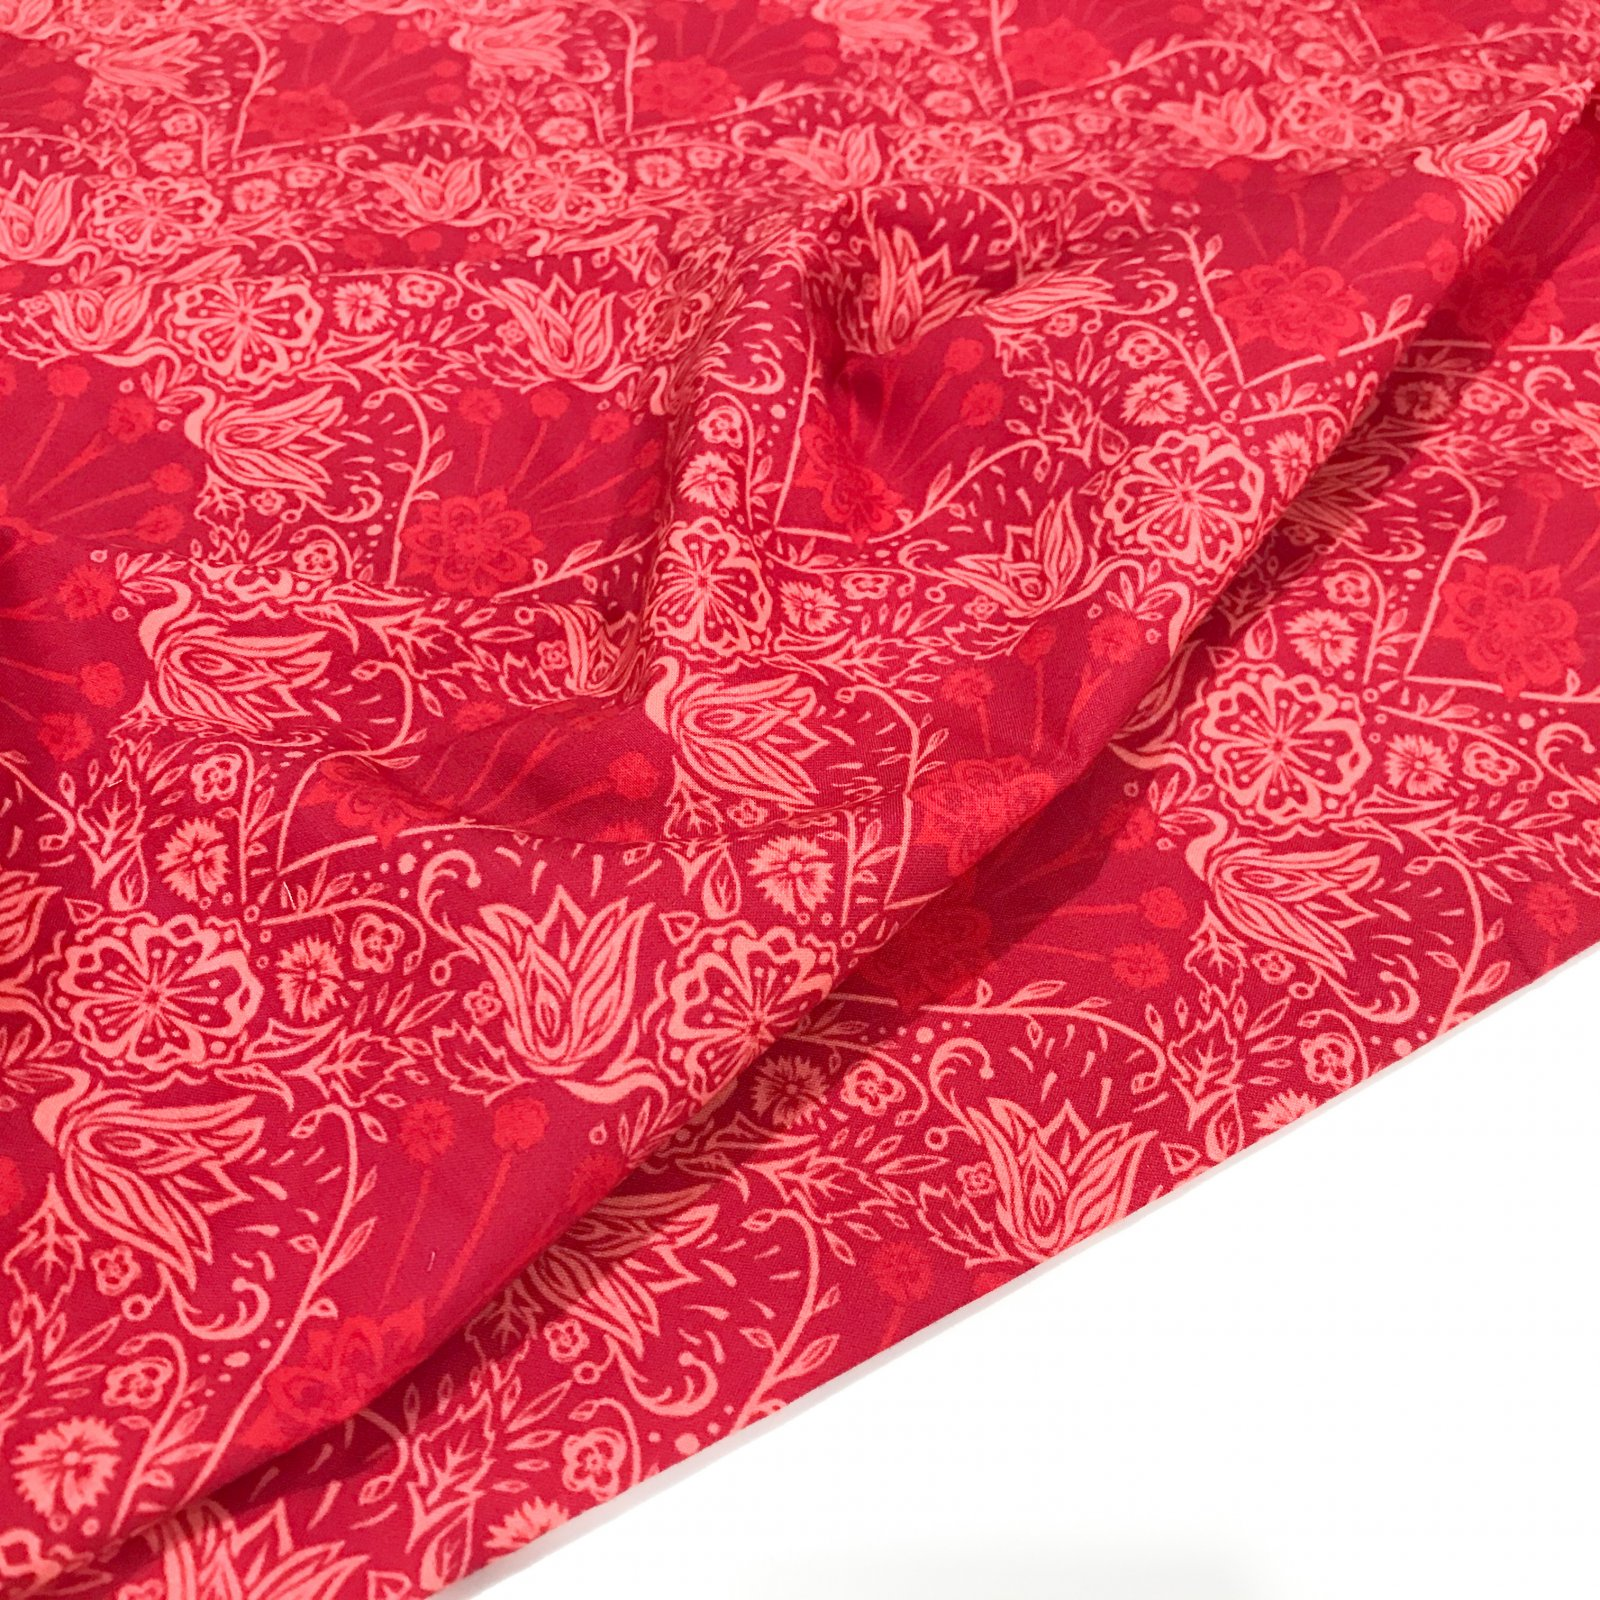 Cotton Poplin -  Blooming Garland - Red